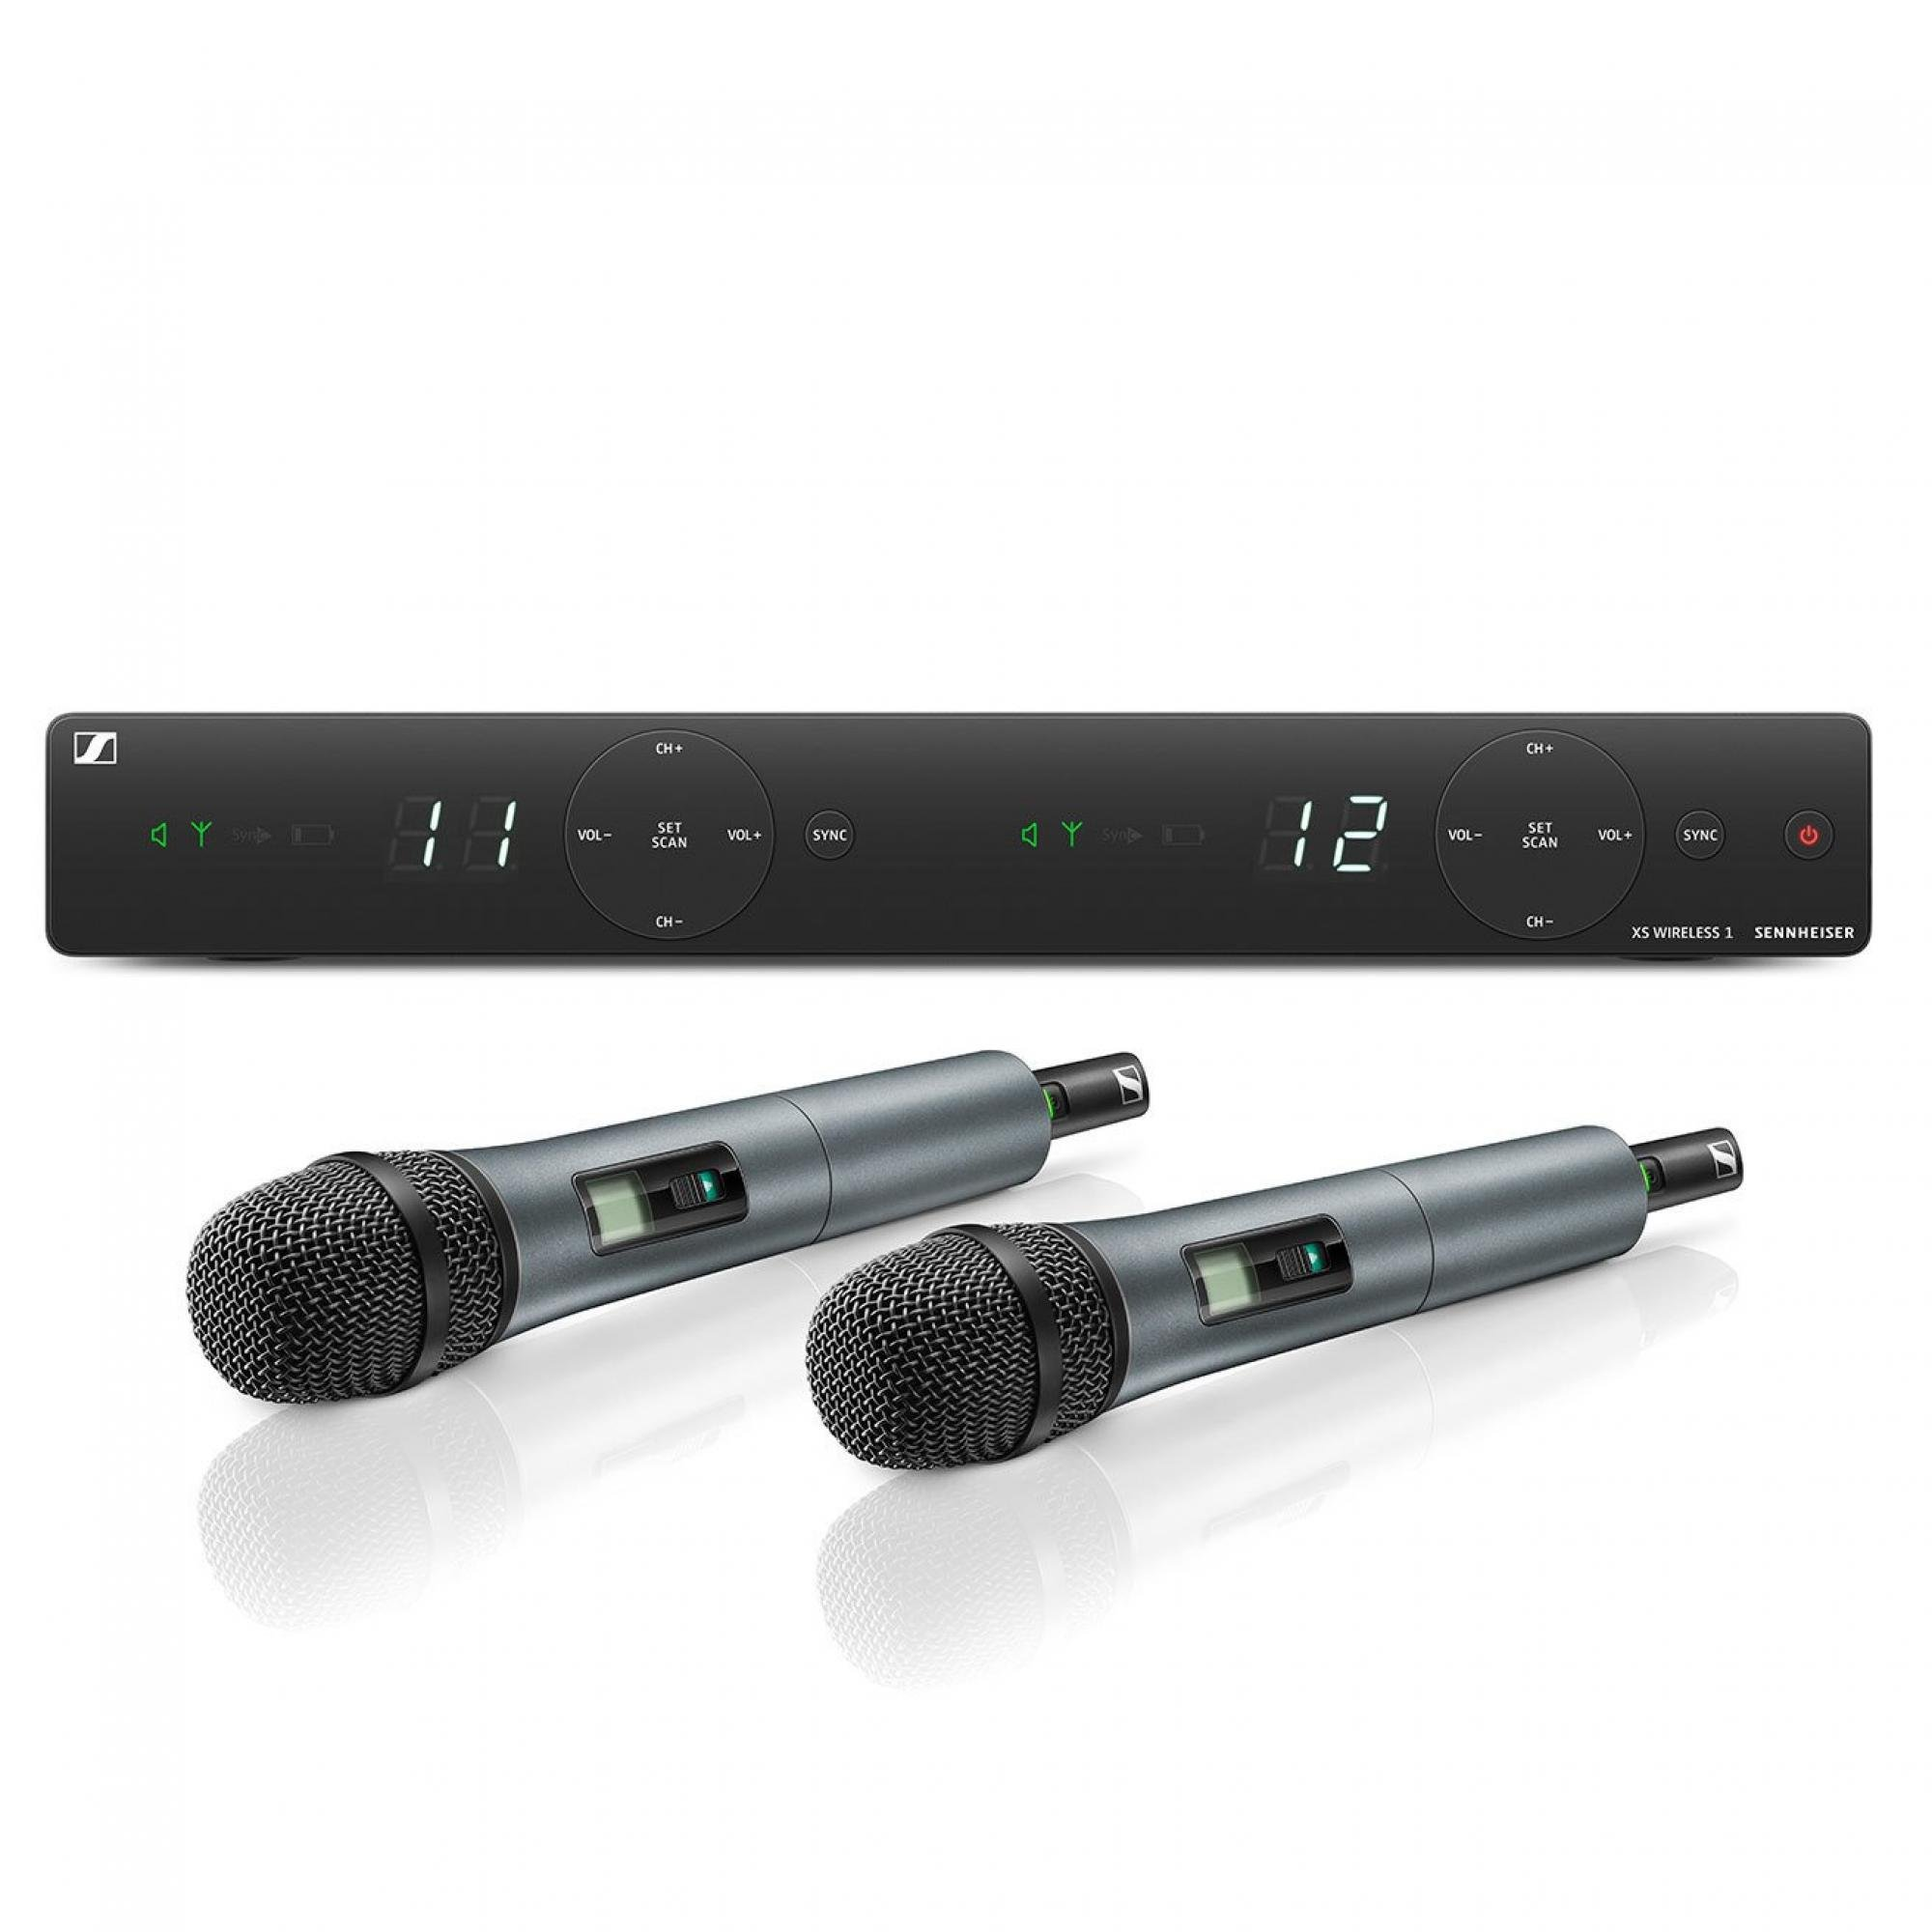 microfone sem fio especial sennheiser duplo xsw1835du 49920 2000 201145